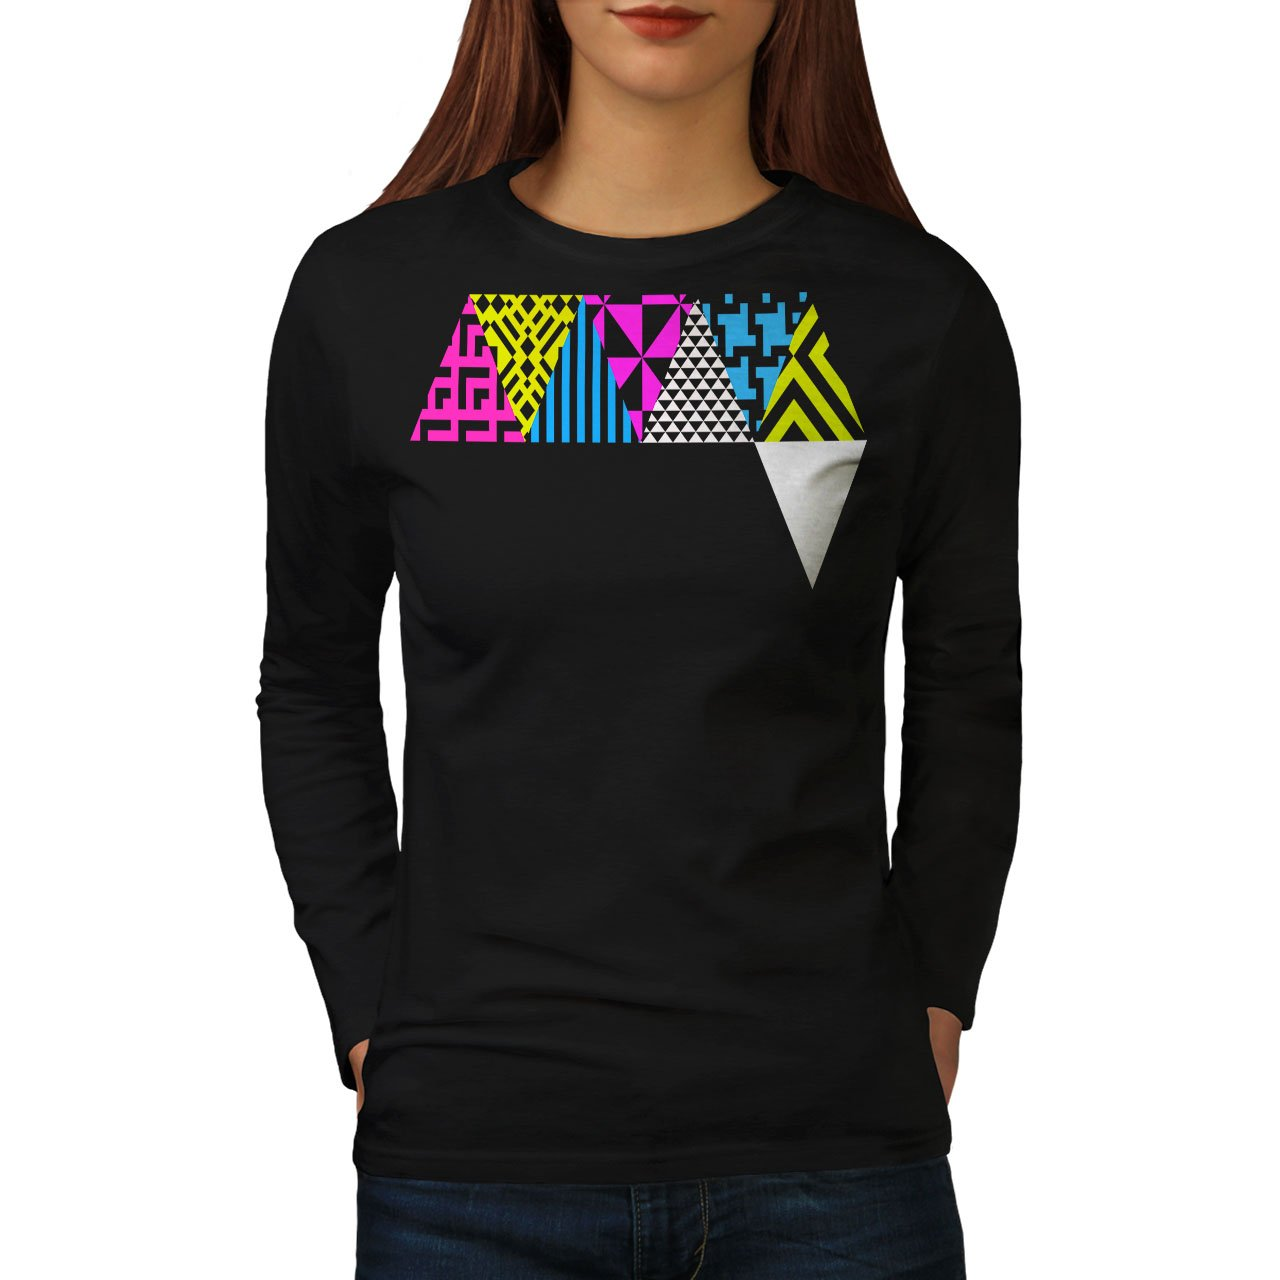 2539fa5b086b Amazon.com: wellcoda Triangle Geometric Womens Long Sleeve T-Shirt, Pattern  Graphic Design: Clothing